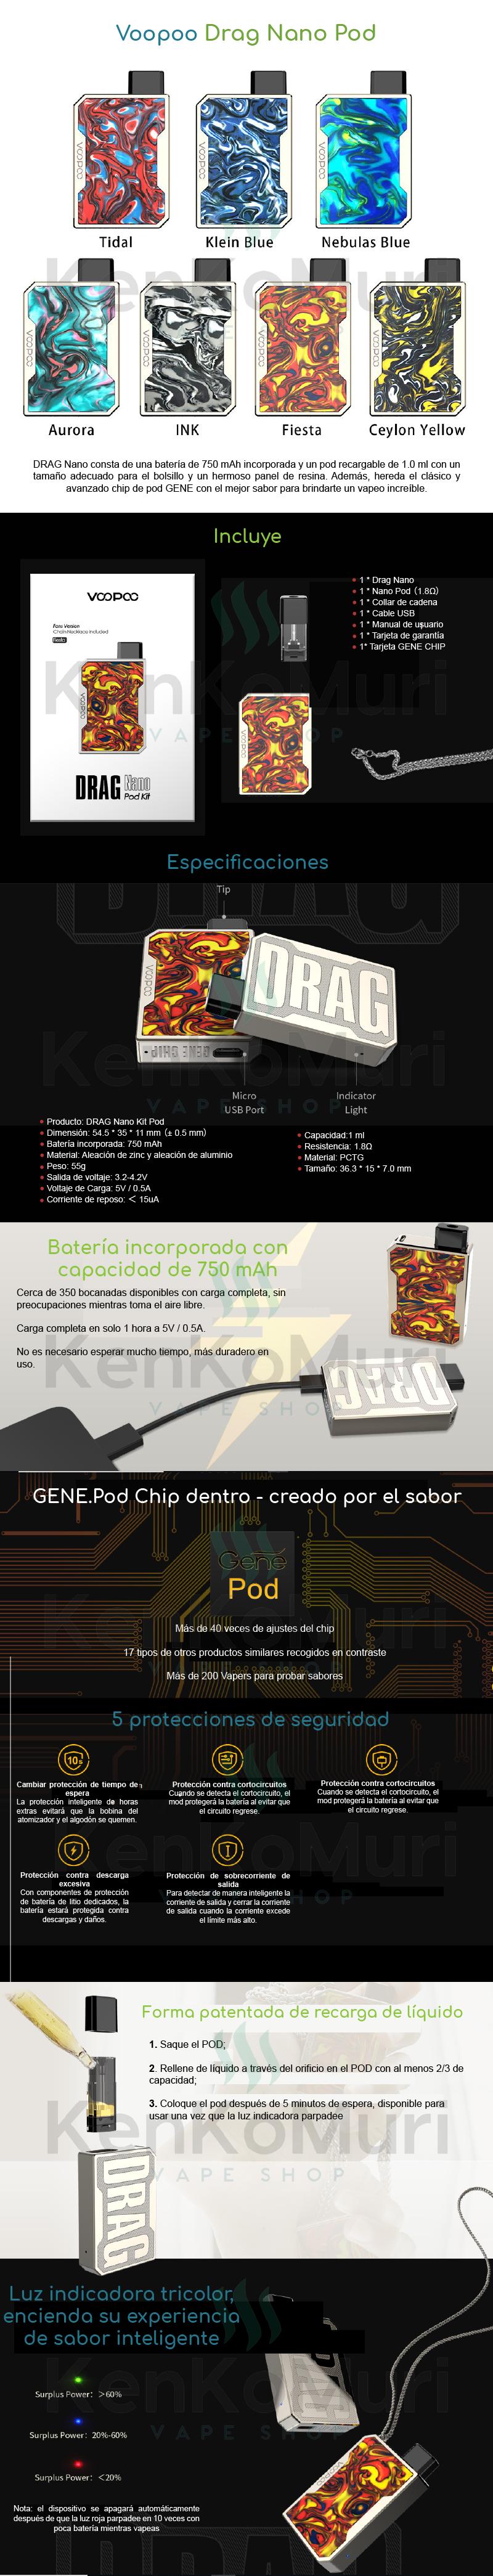 cigarroelectronico-vapeador-voopoo-dragnano-mexico-kenkomuri